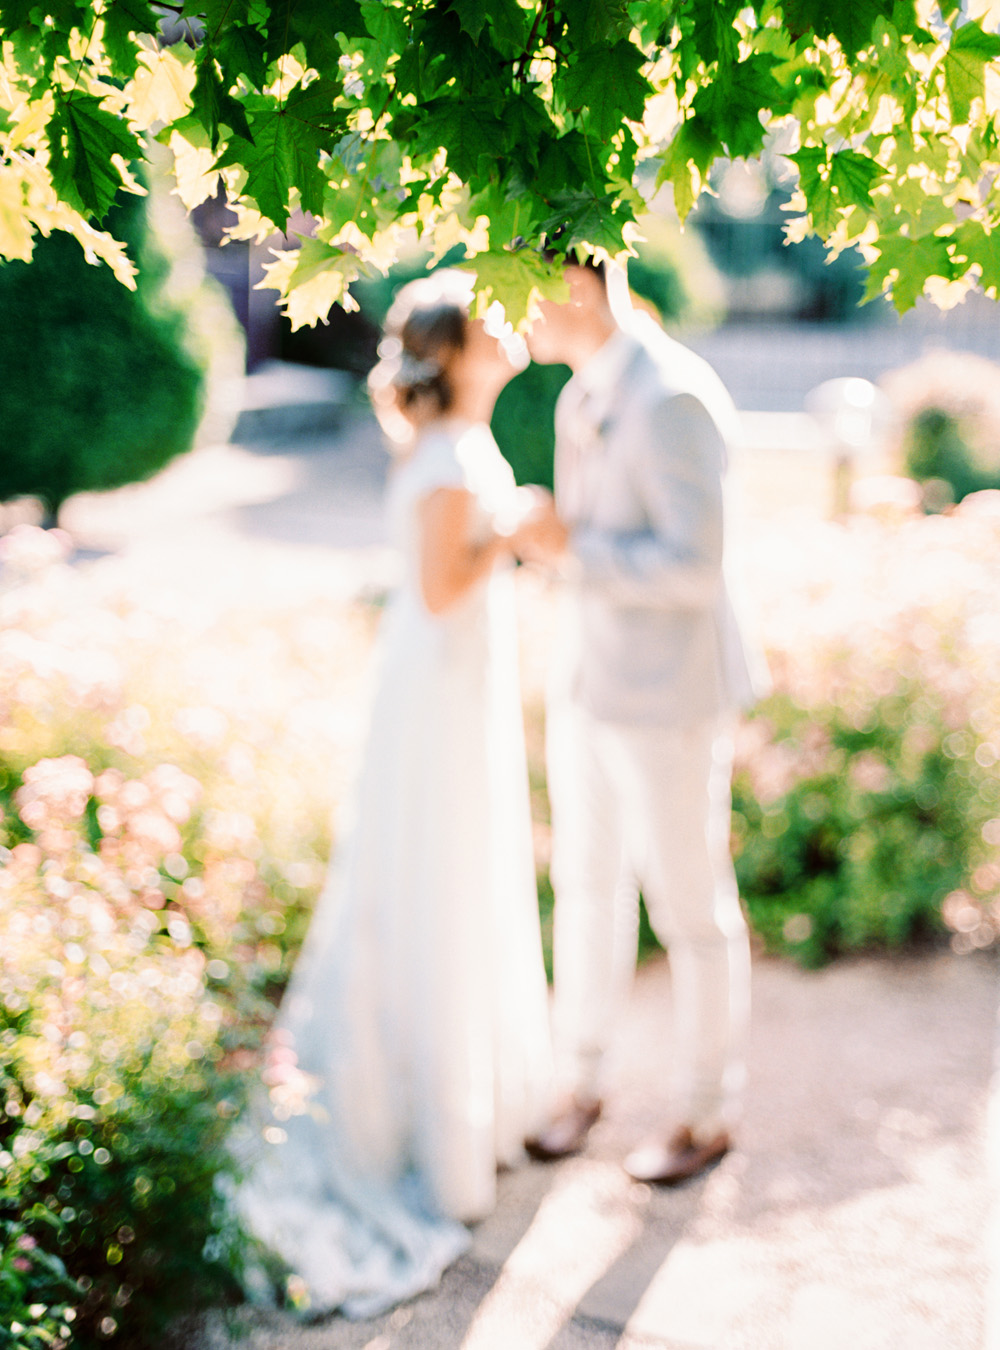 Romantic Blue Lakeside Wedding Inspiration - Couple Kissing